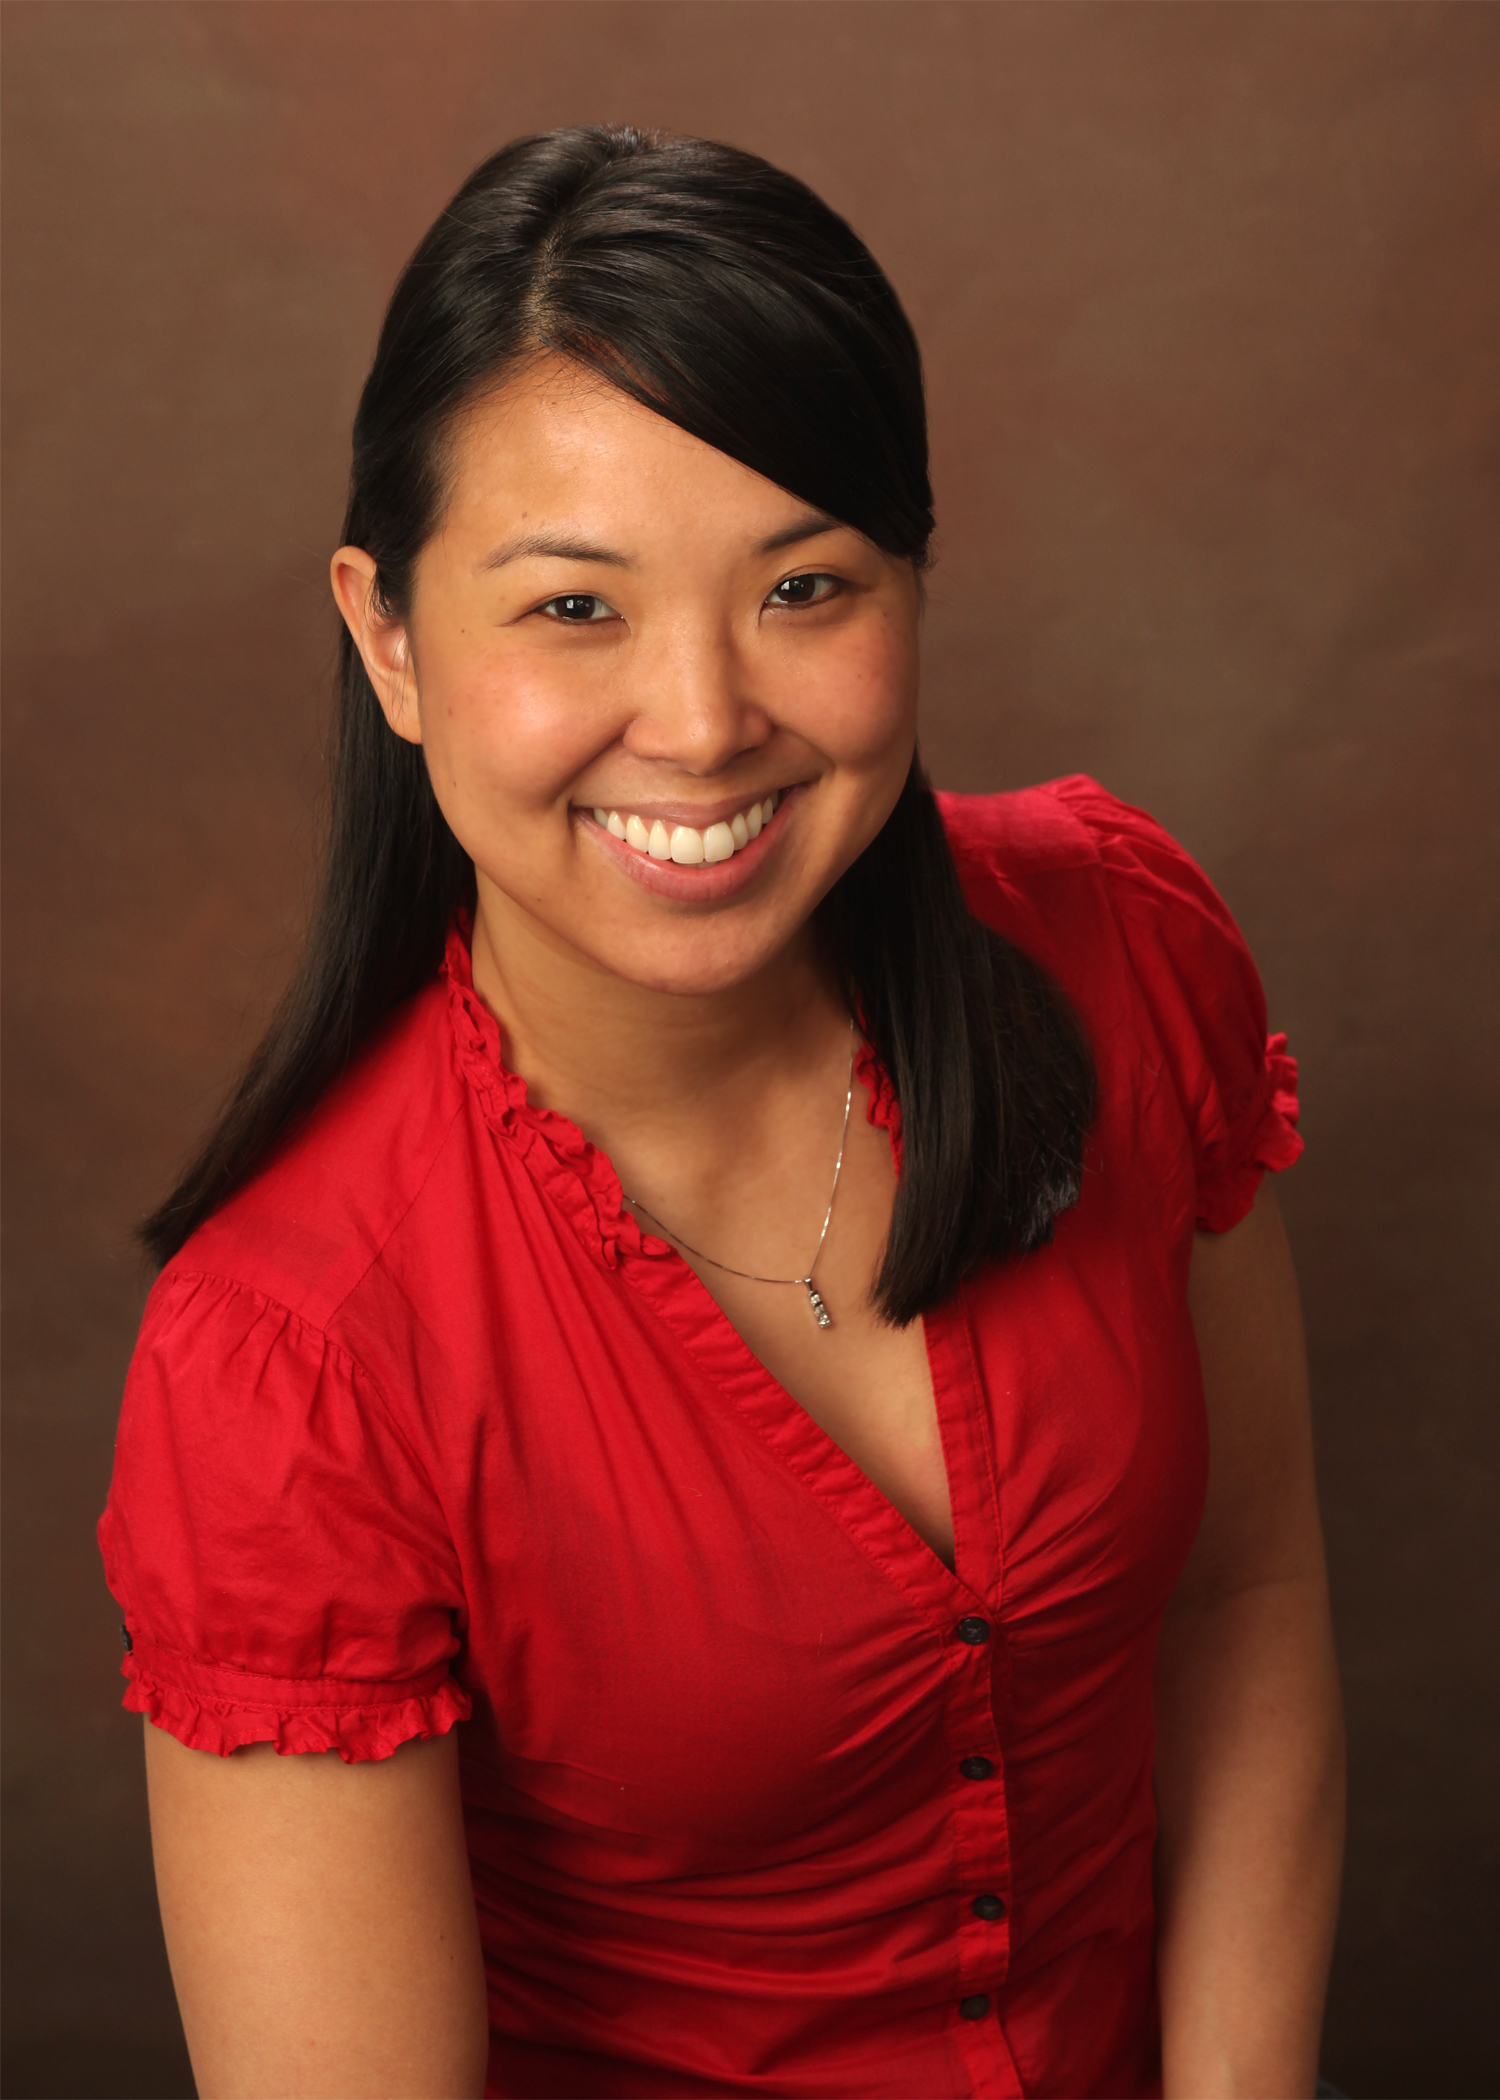 Michelle-Chu-headshot